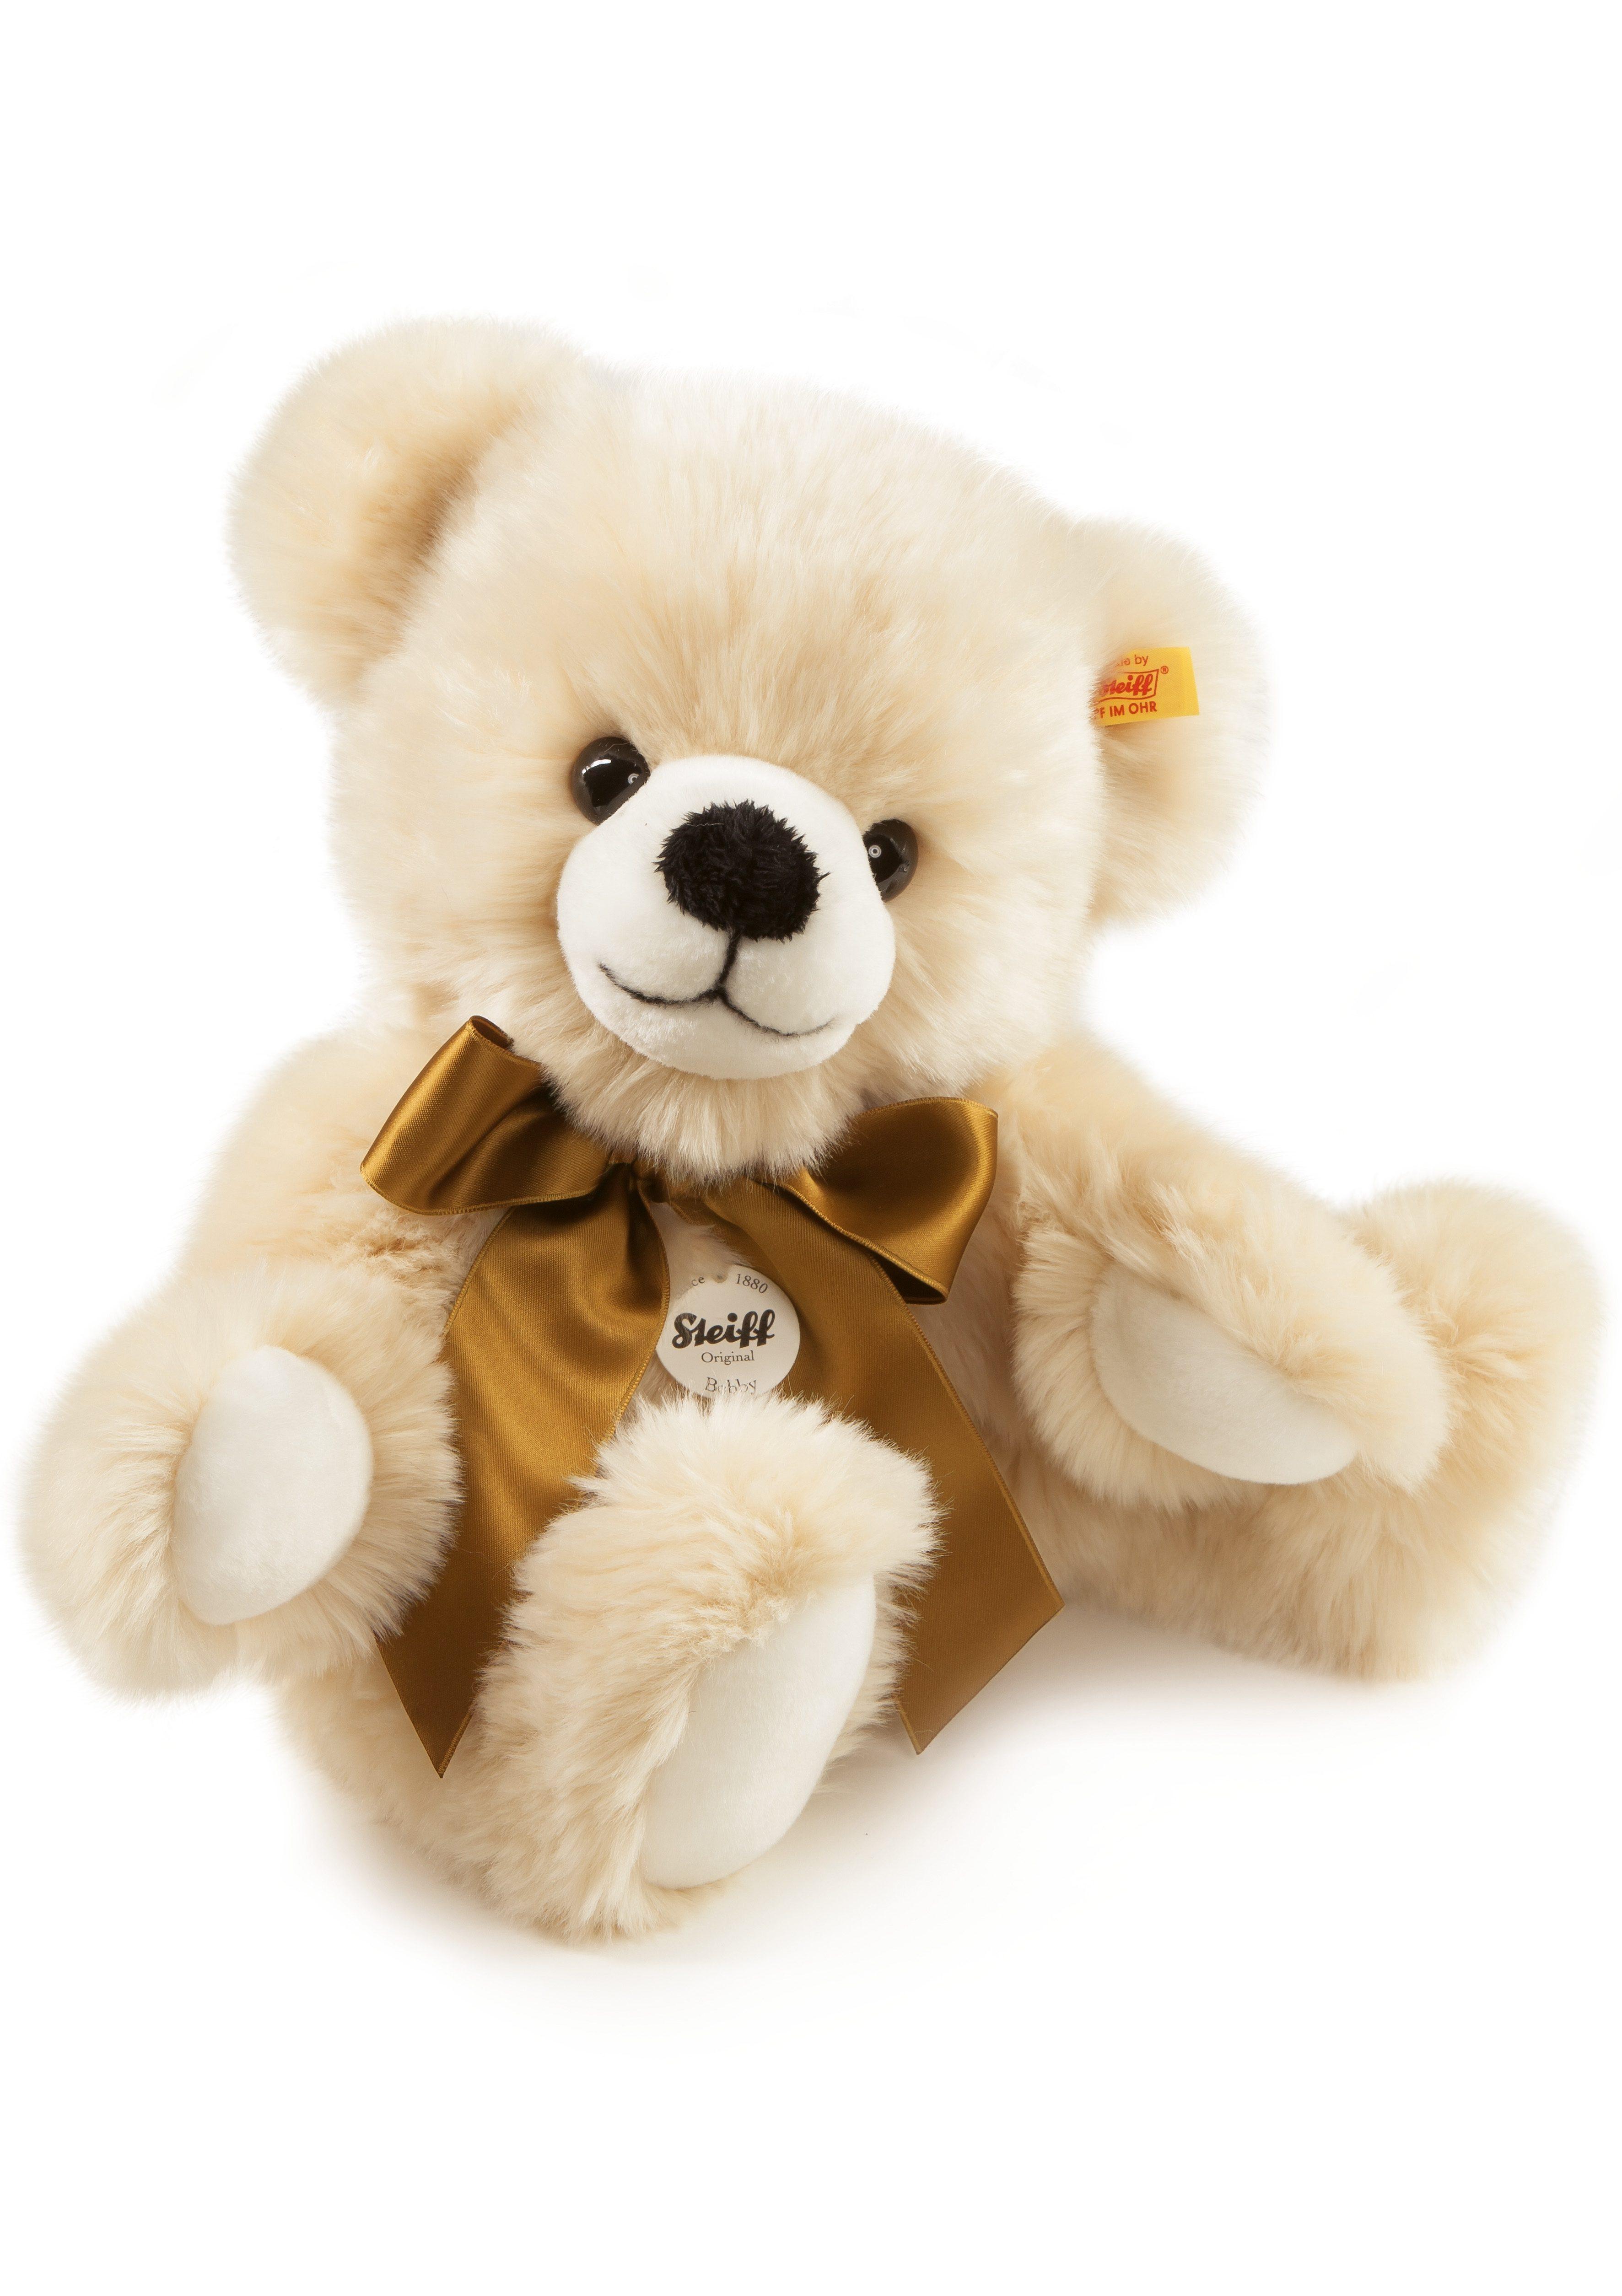 Steiff Plüschtier, »Bobby Schlenker-Teddybär«